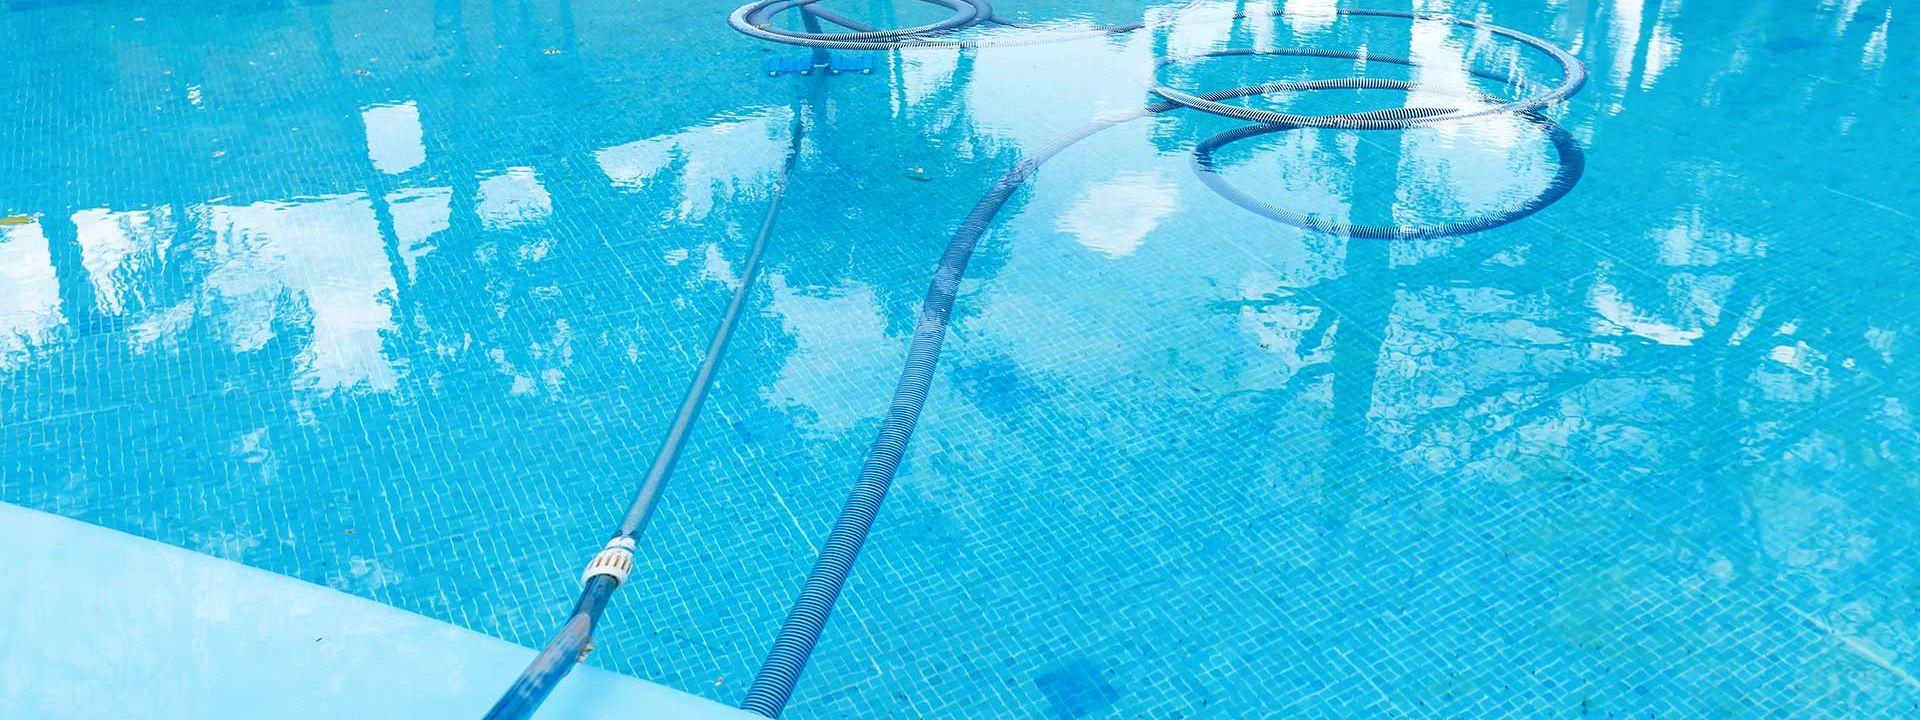 limpiar piscina verde sin vaciar best limpieza with